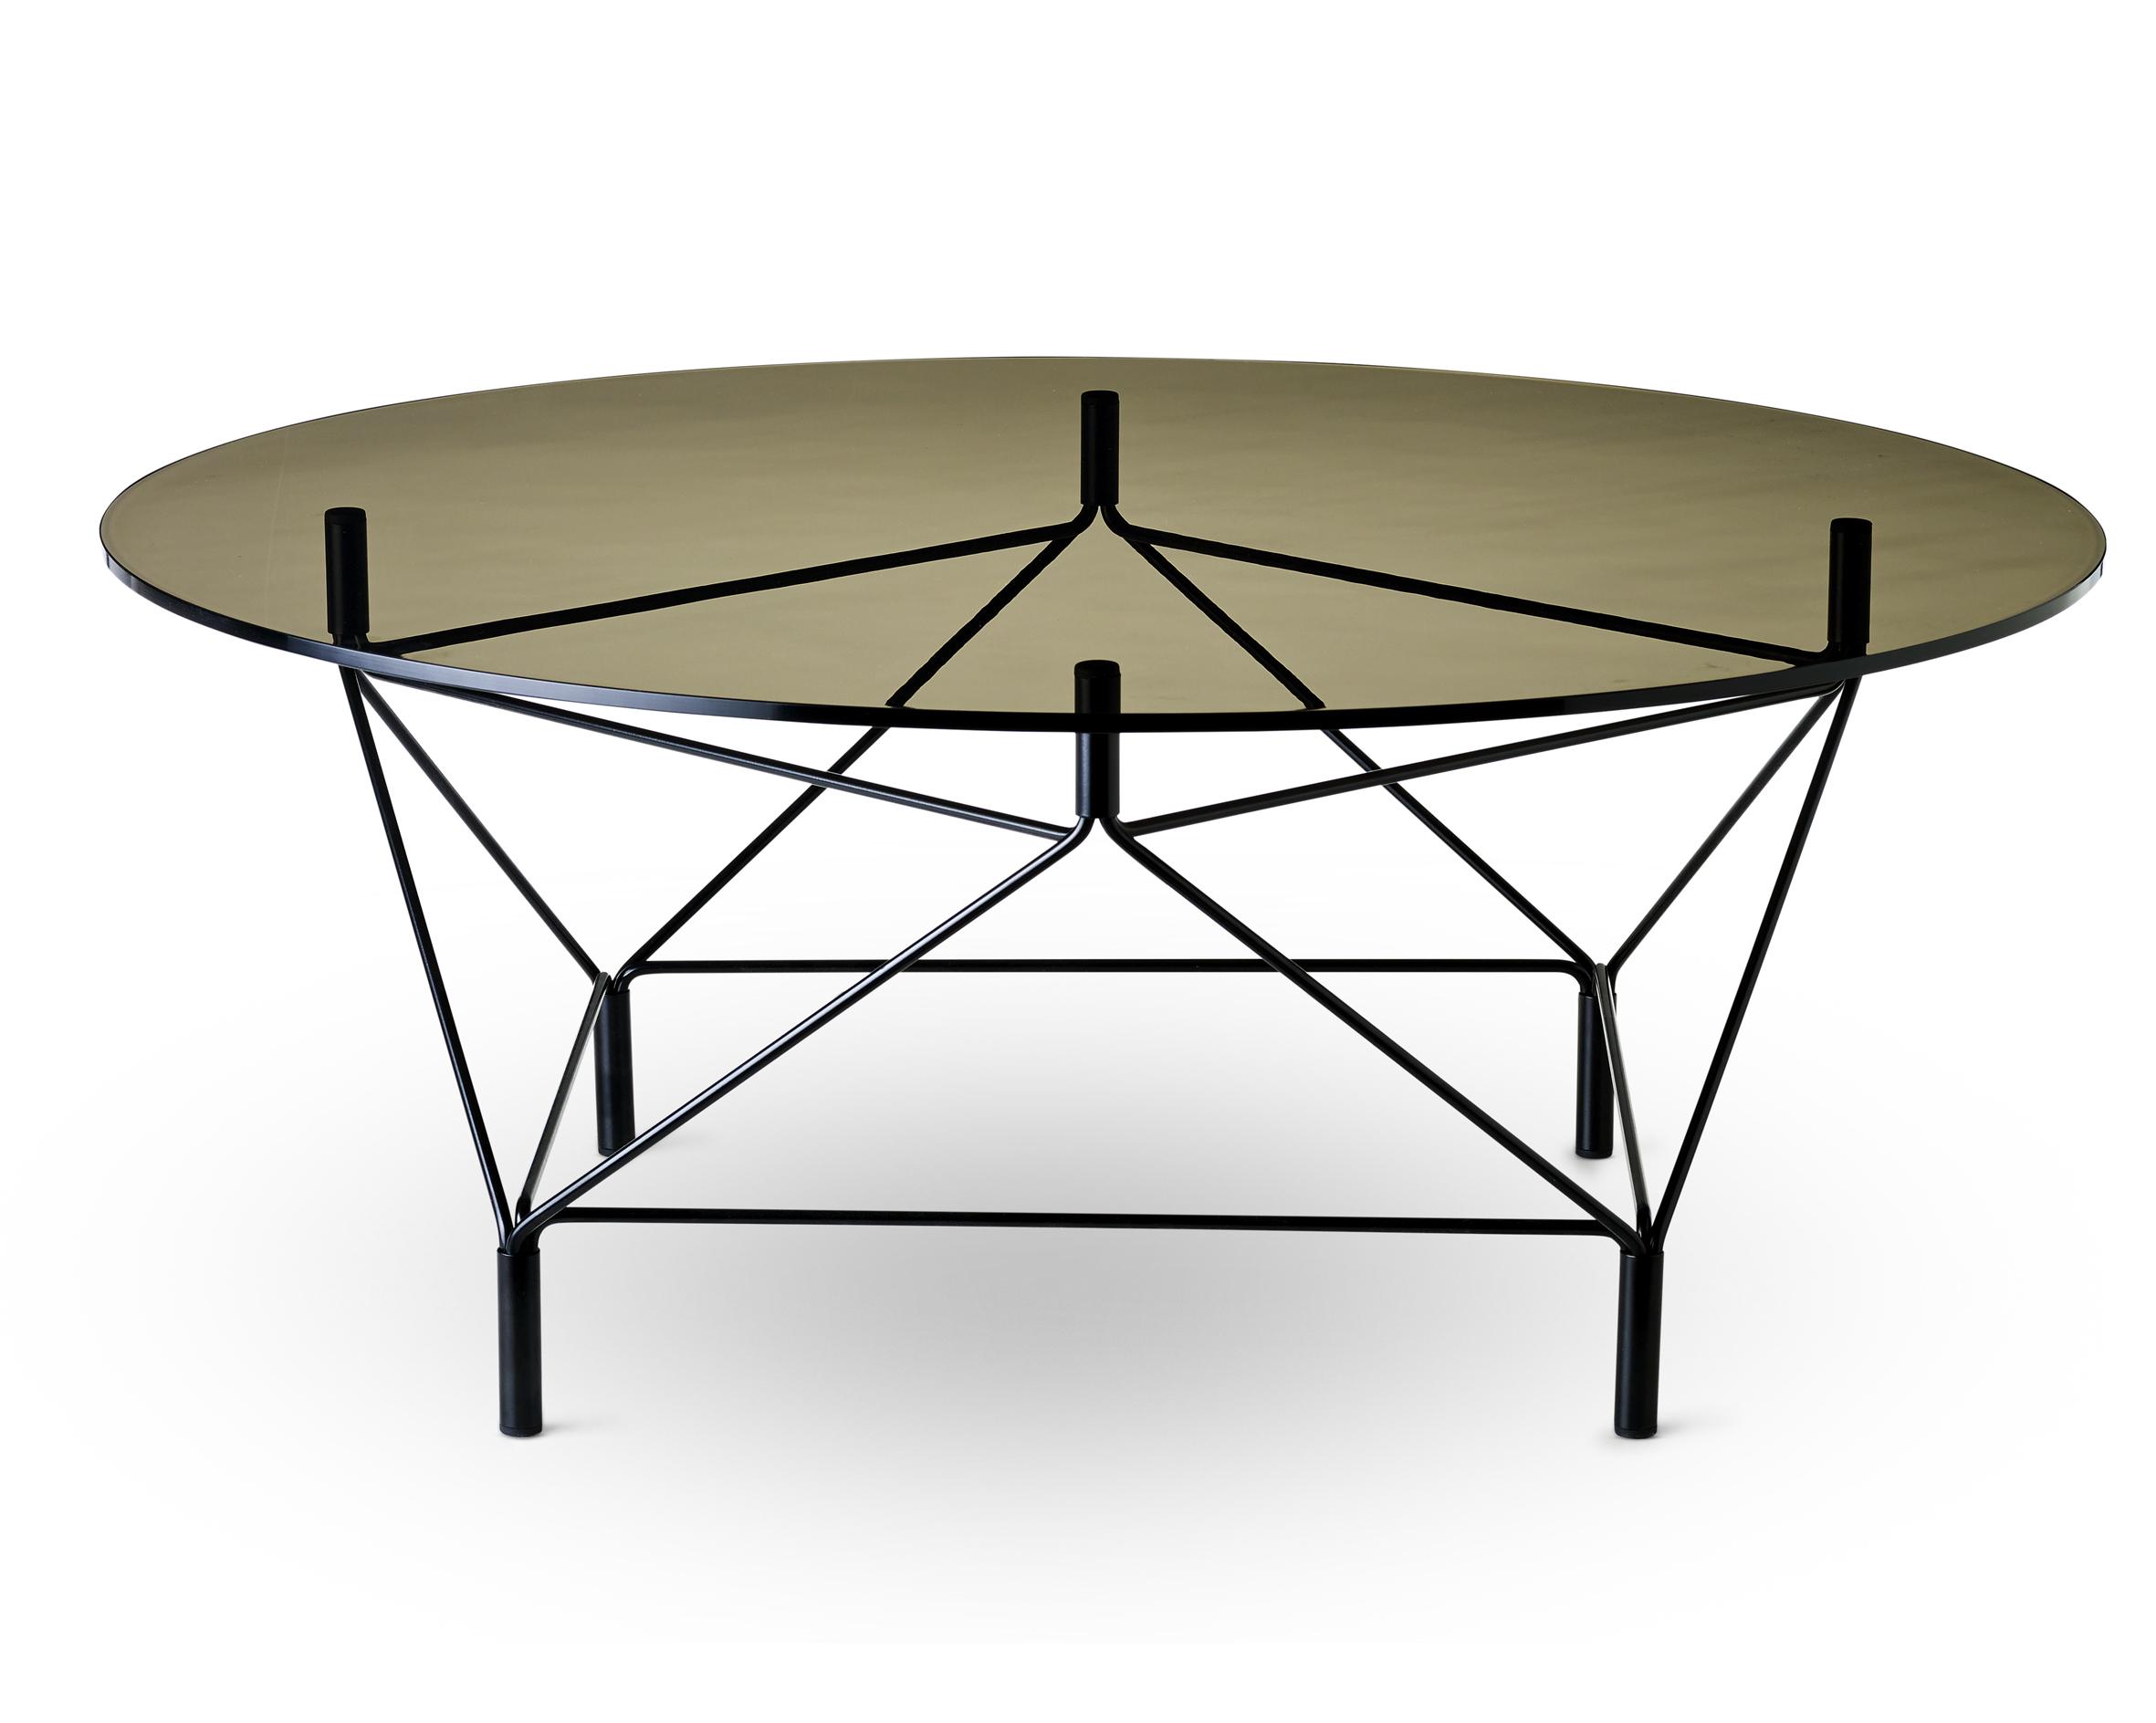 Spider coffee table 105cm Diameter